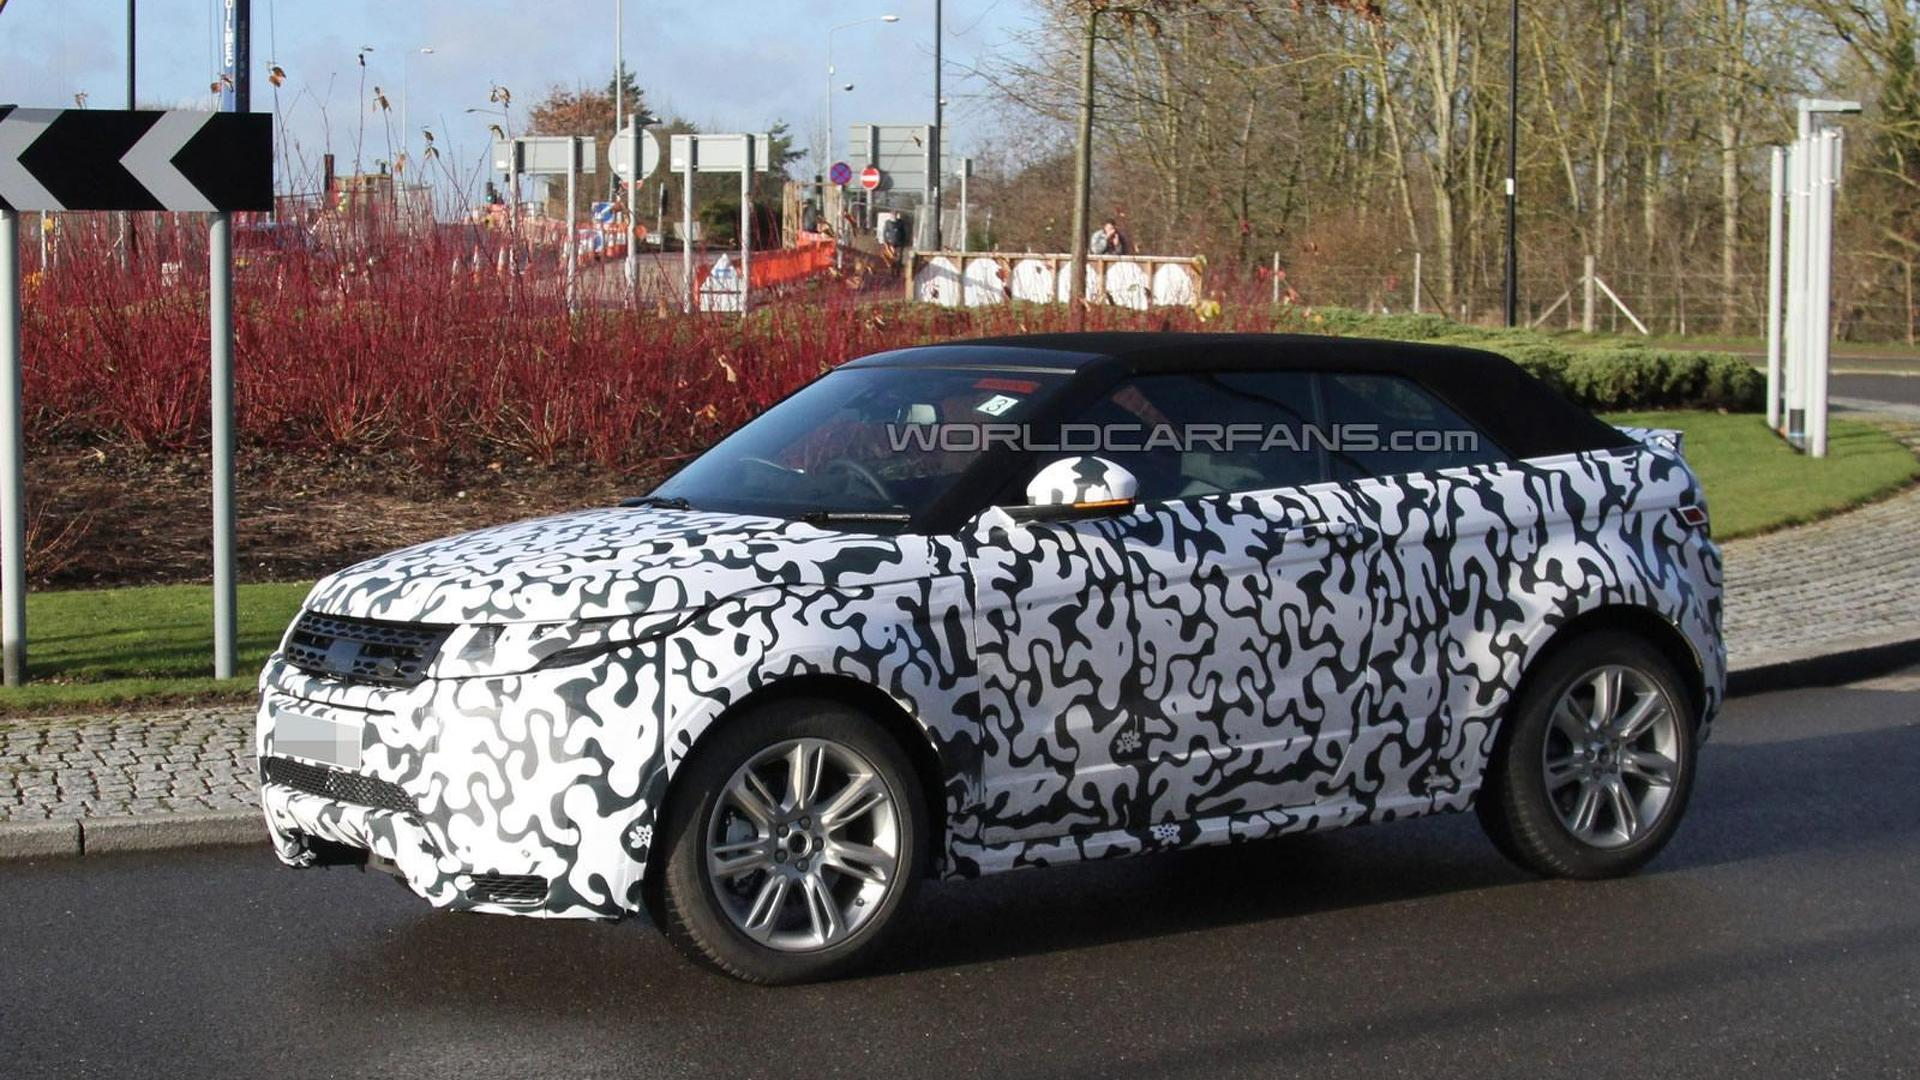 2016 Range Rover Evoque Cabrio spied testing in UK